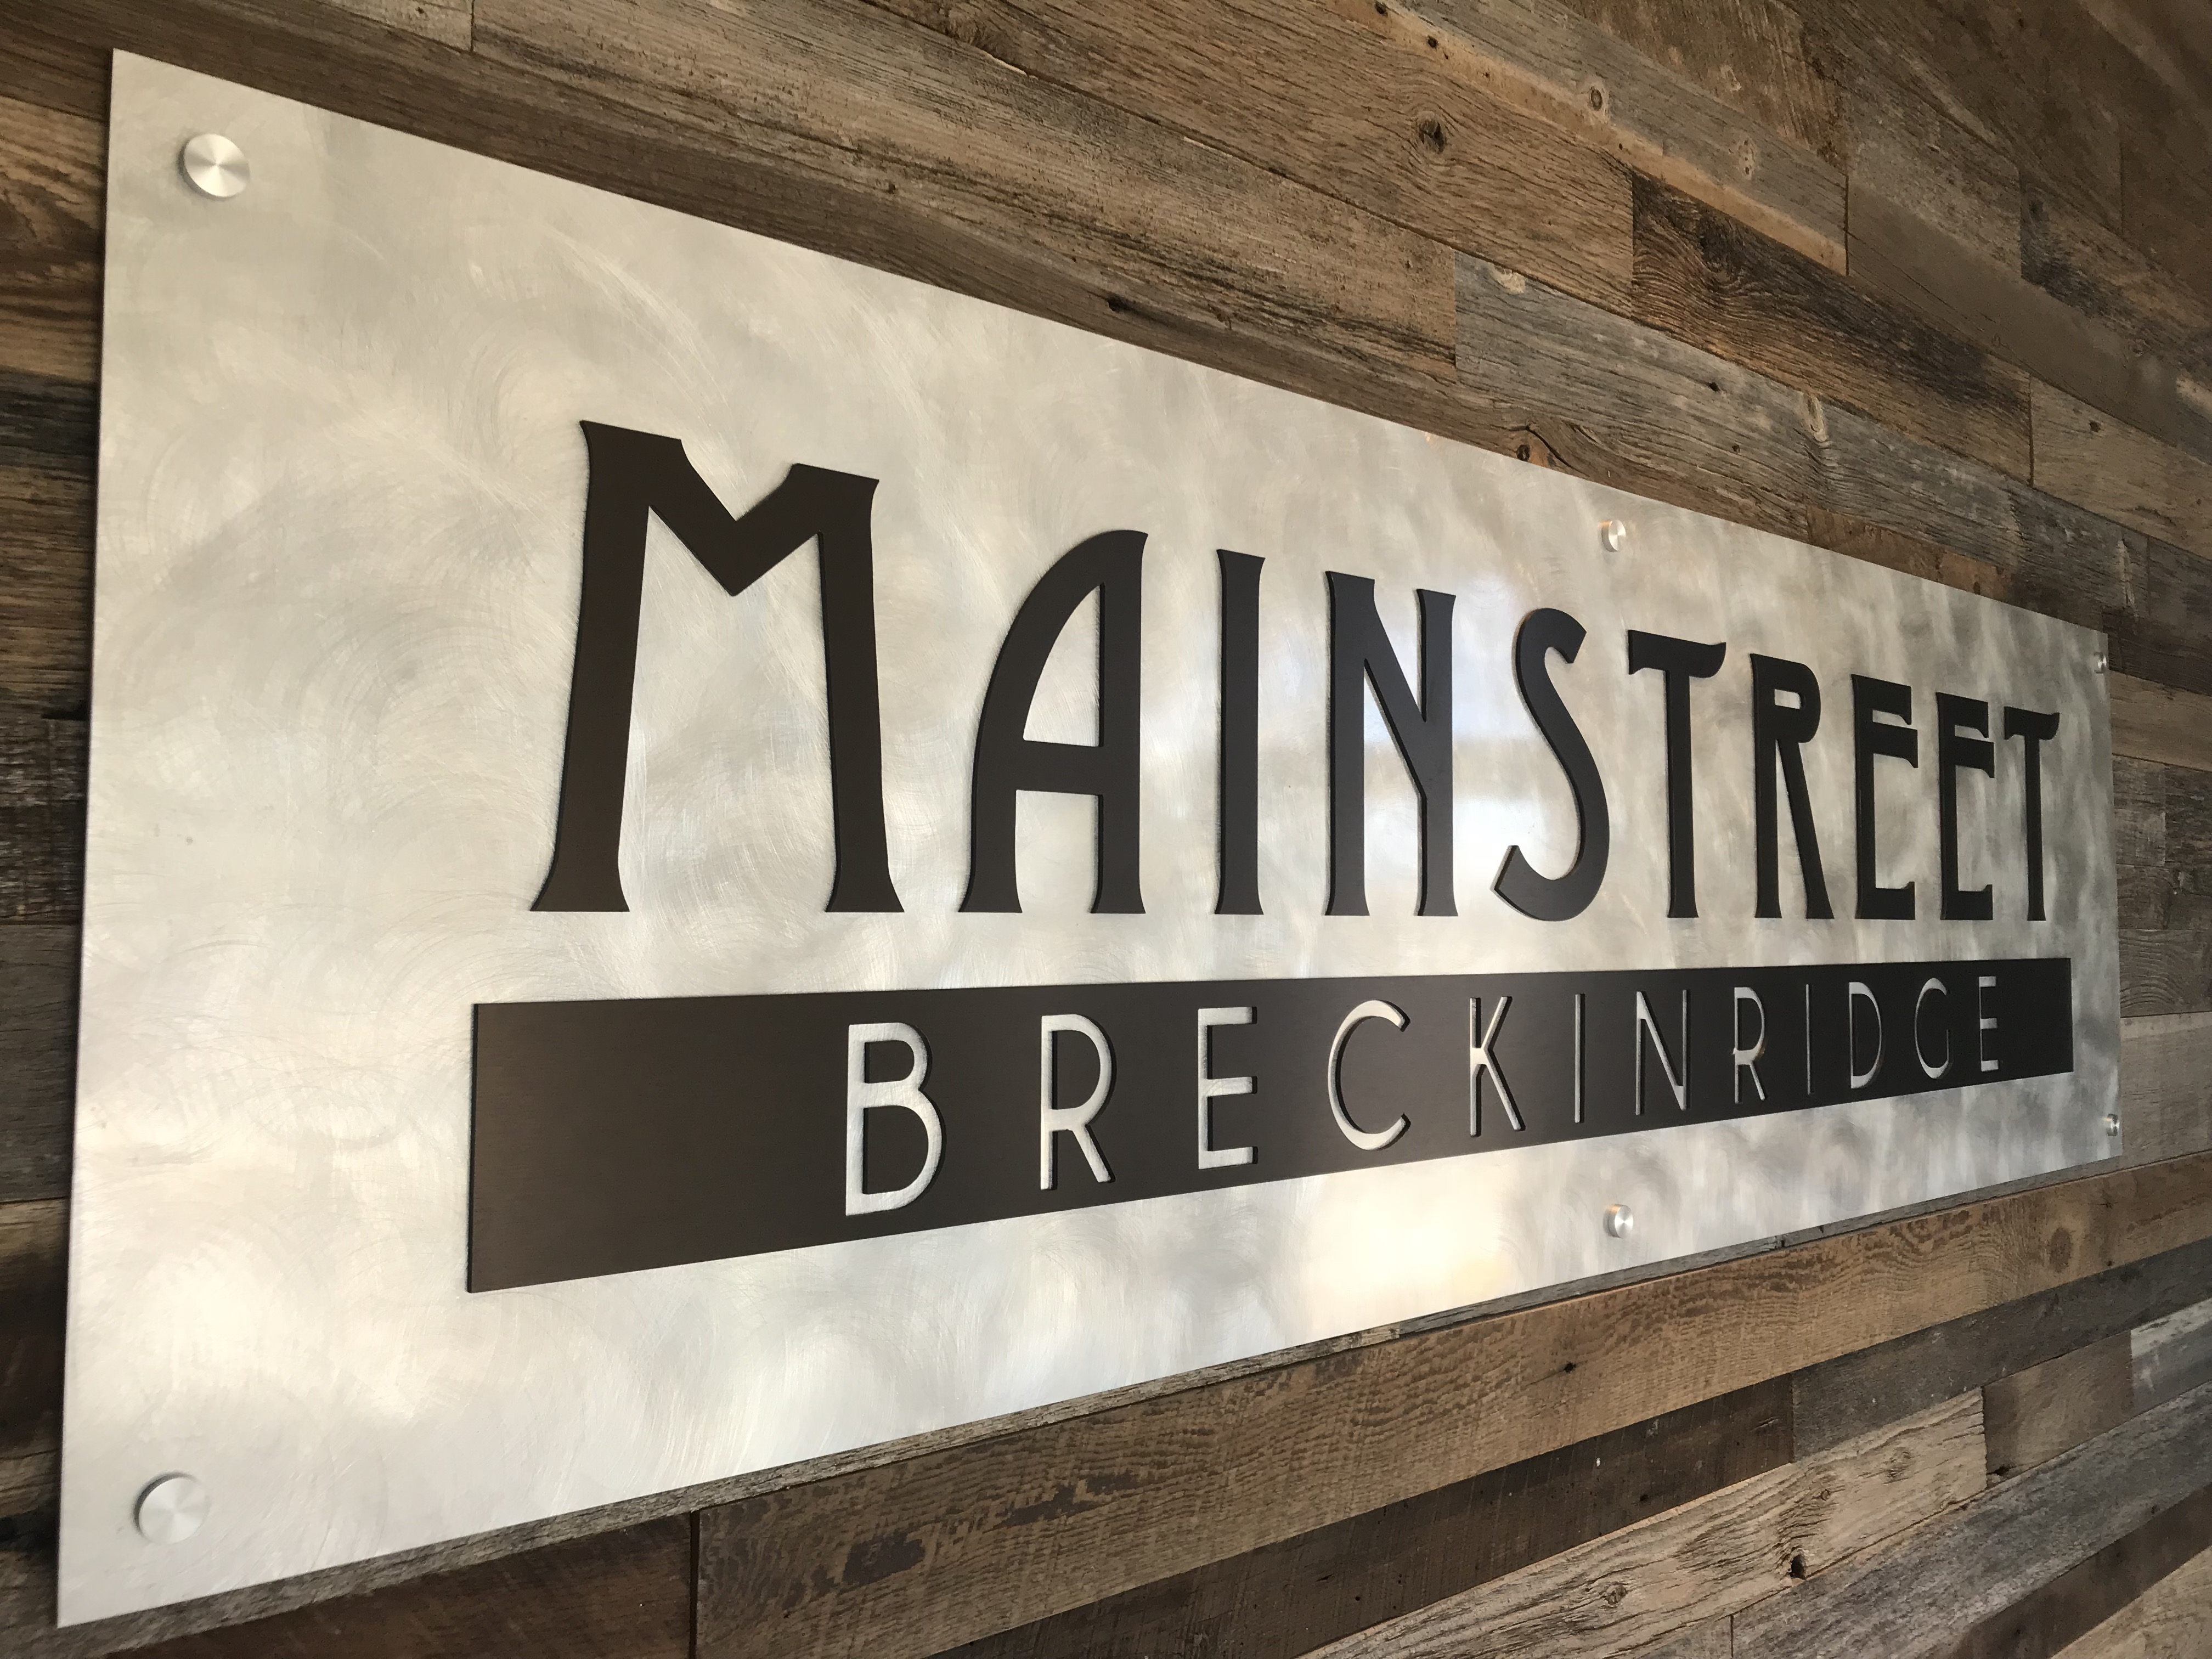 MainStreet Breckinridge